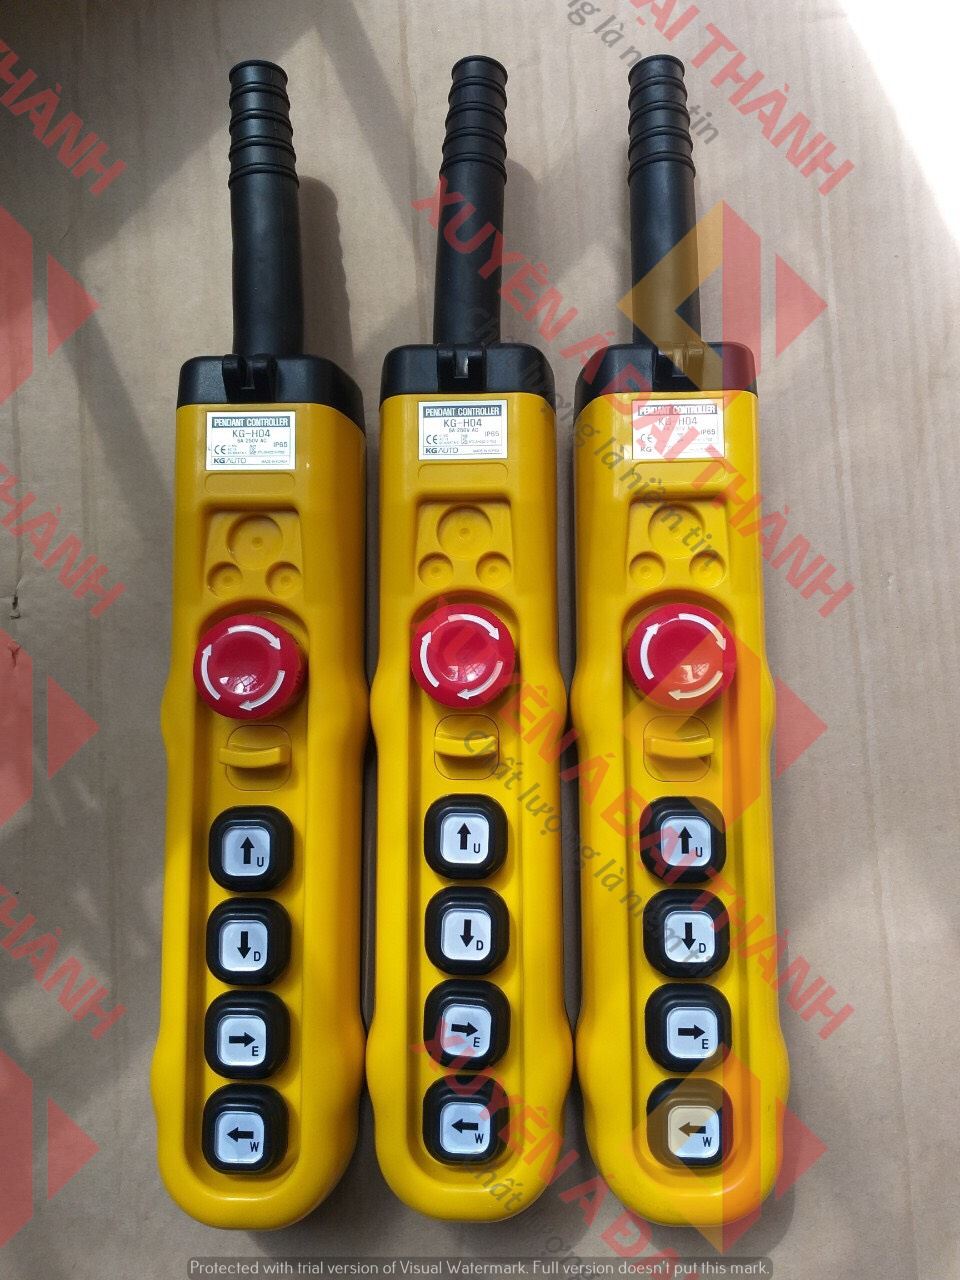 Remote-Palang-Xich-Dien-Han-Quoc